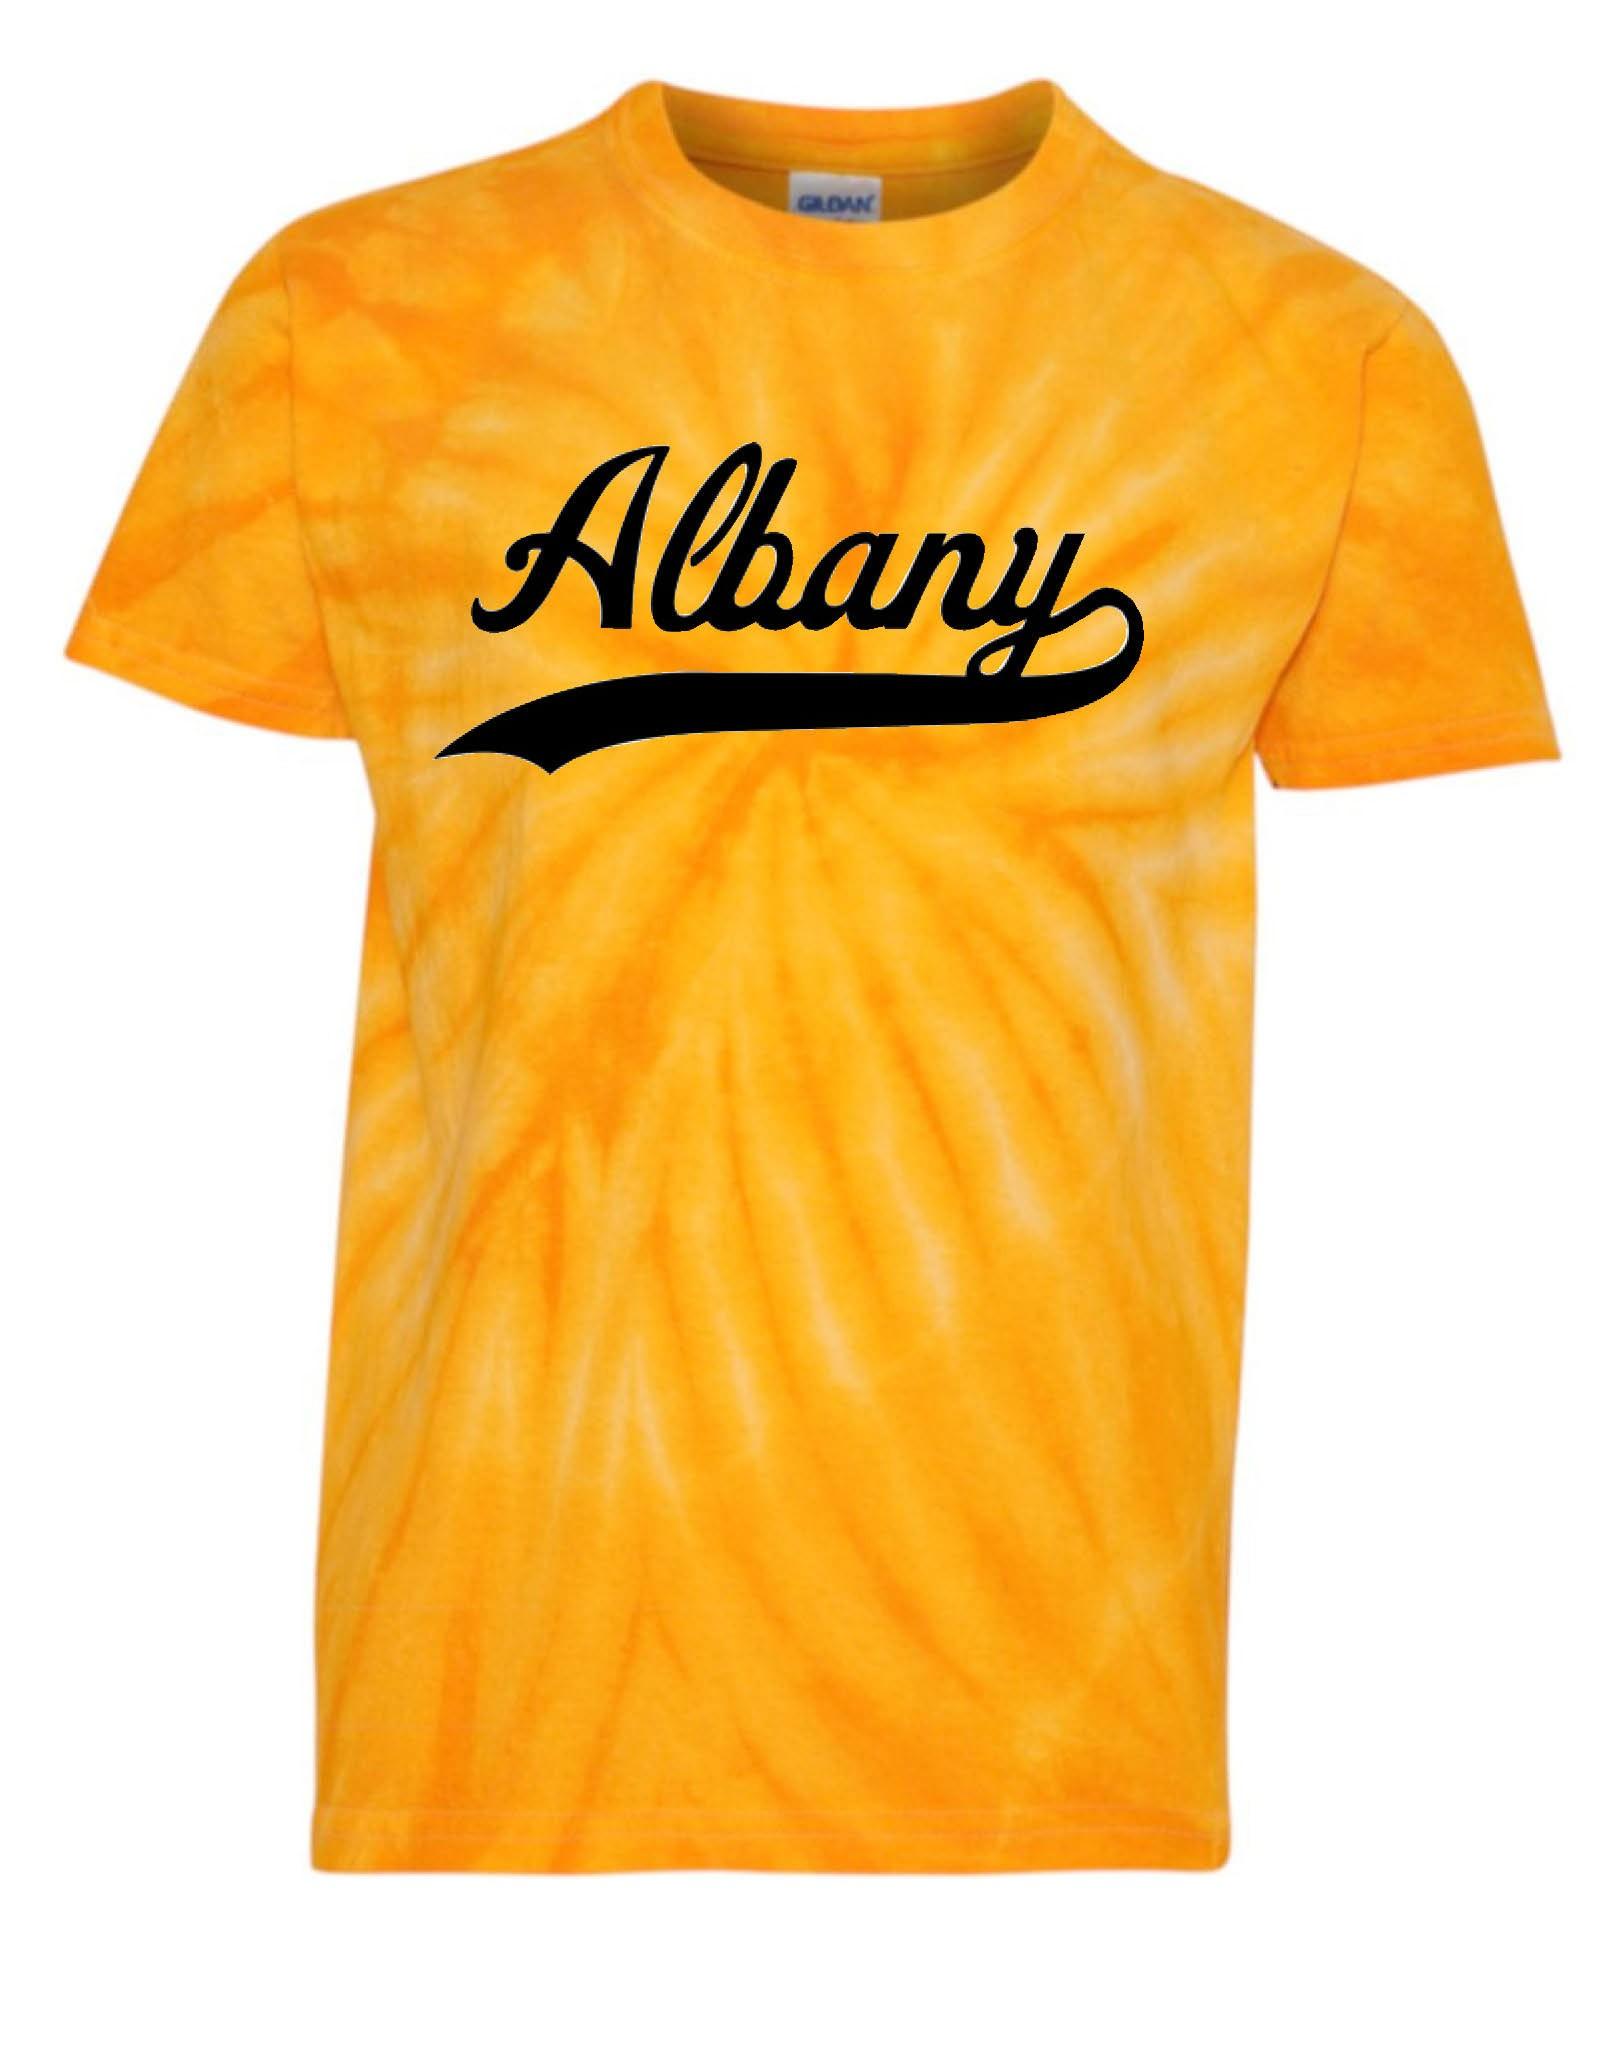 Albany Swoosh Tye Dye T Shirts